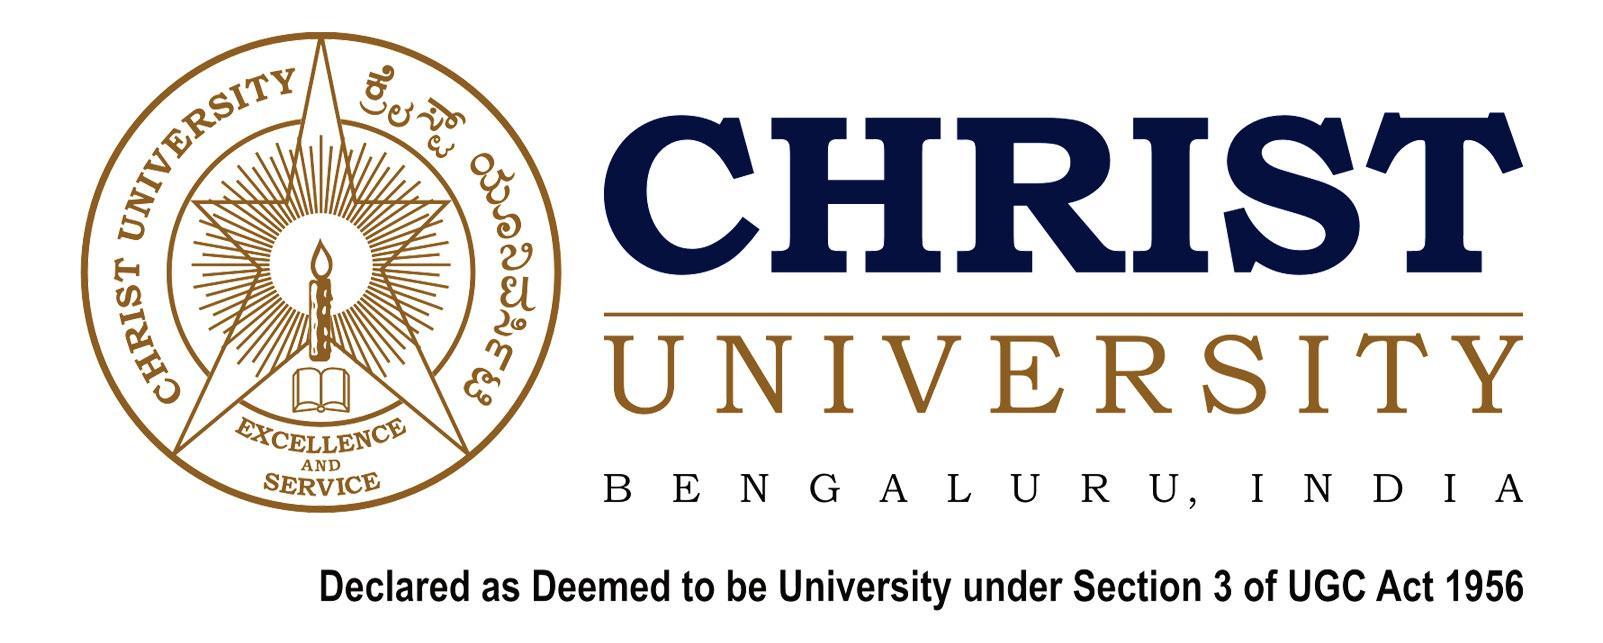 Christ University Decennial Celebration 2017